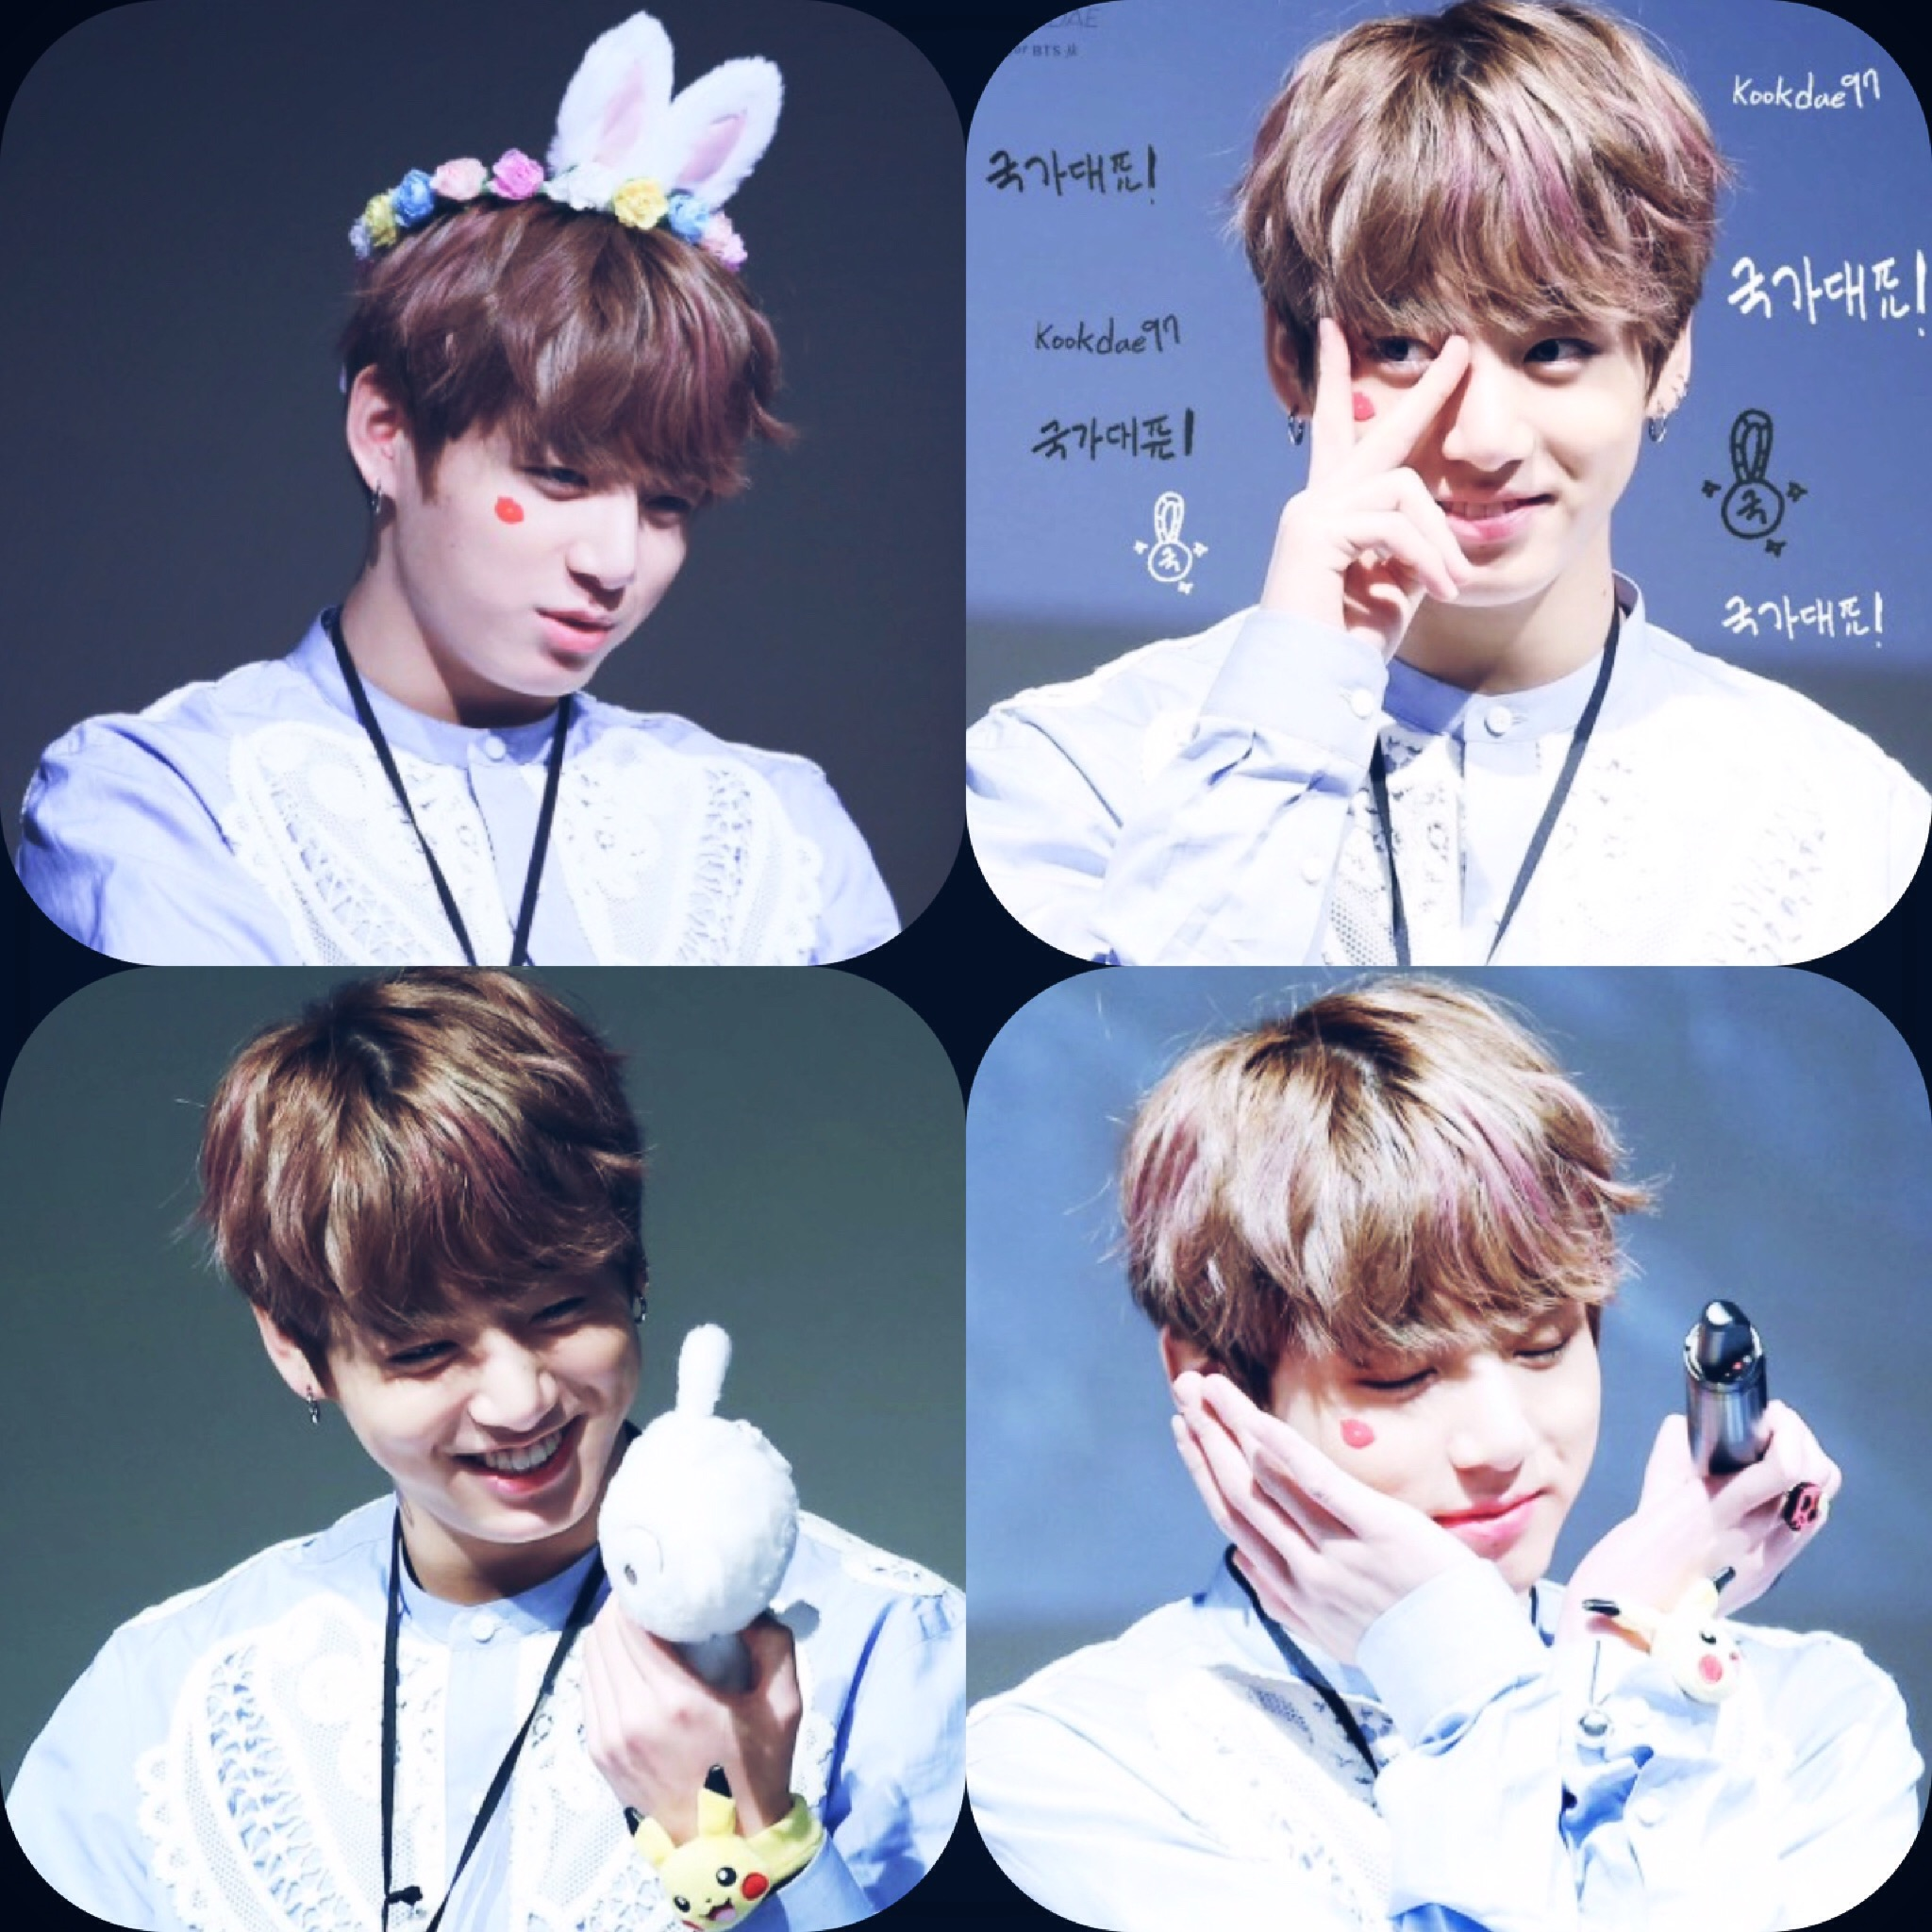 bts bangtanboys jungkookie kookie jungkook cute kawaii Cute Cupcake Drawings cute cupcake clipart with faces